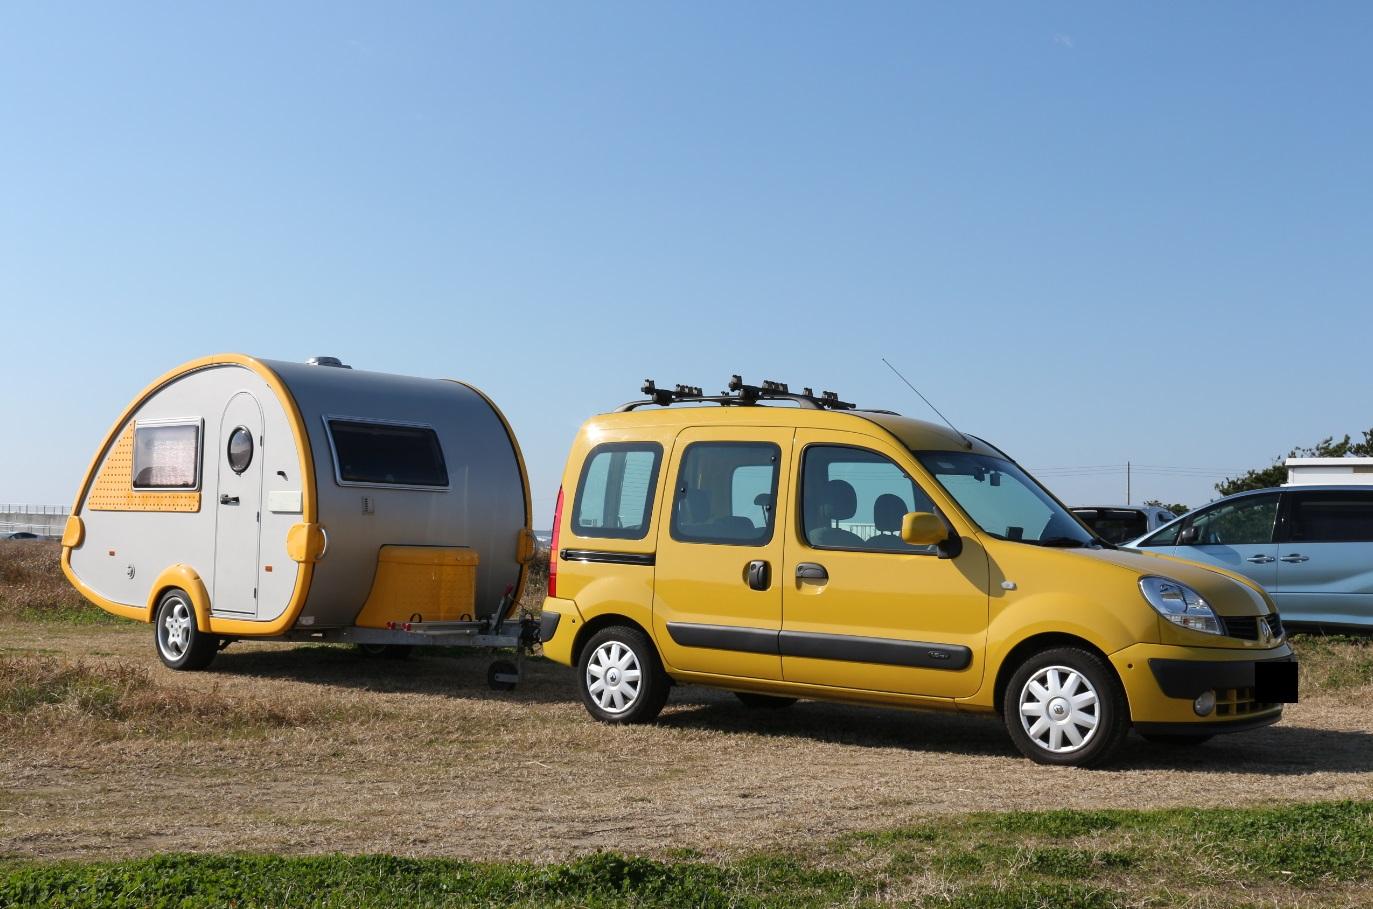 yellow kangoo, renault, kangoo, smallegg, caravan, camping trailer, ルノー, キャンピングトレーラー, キャラバン, カングー, スモールエッグ,